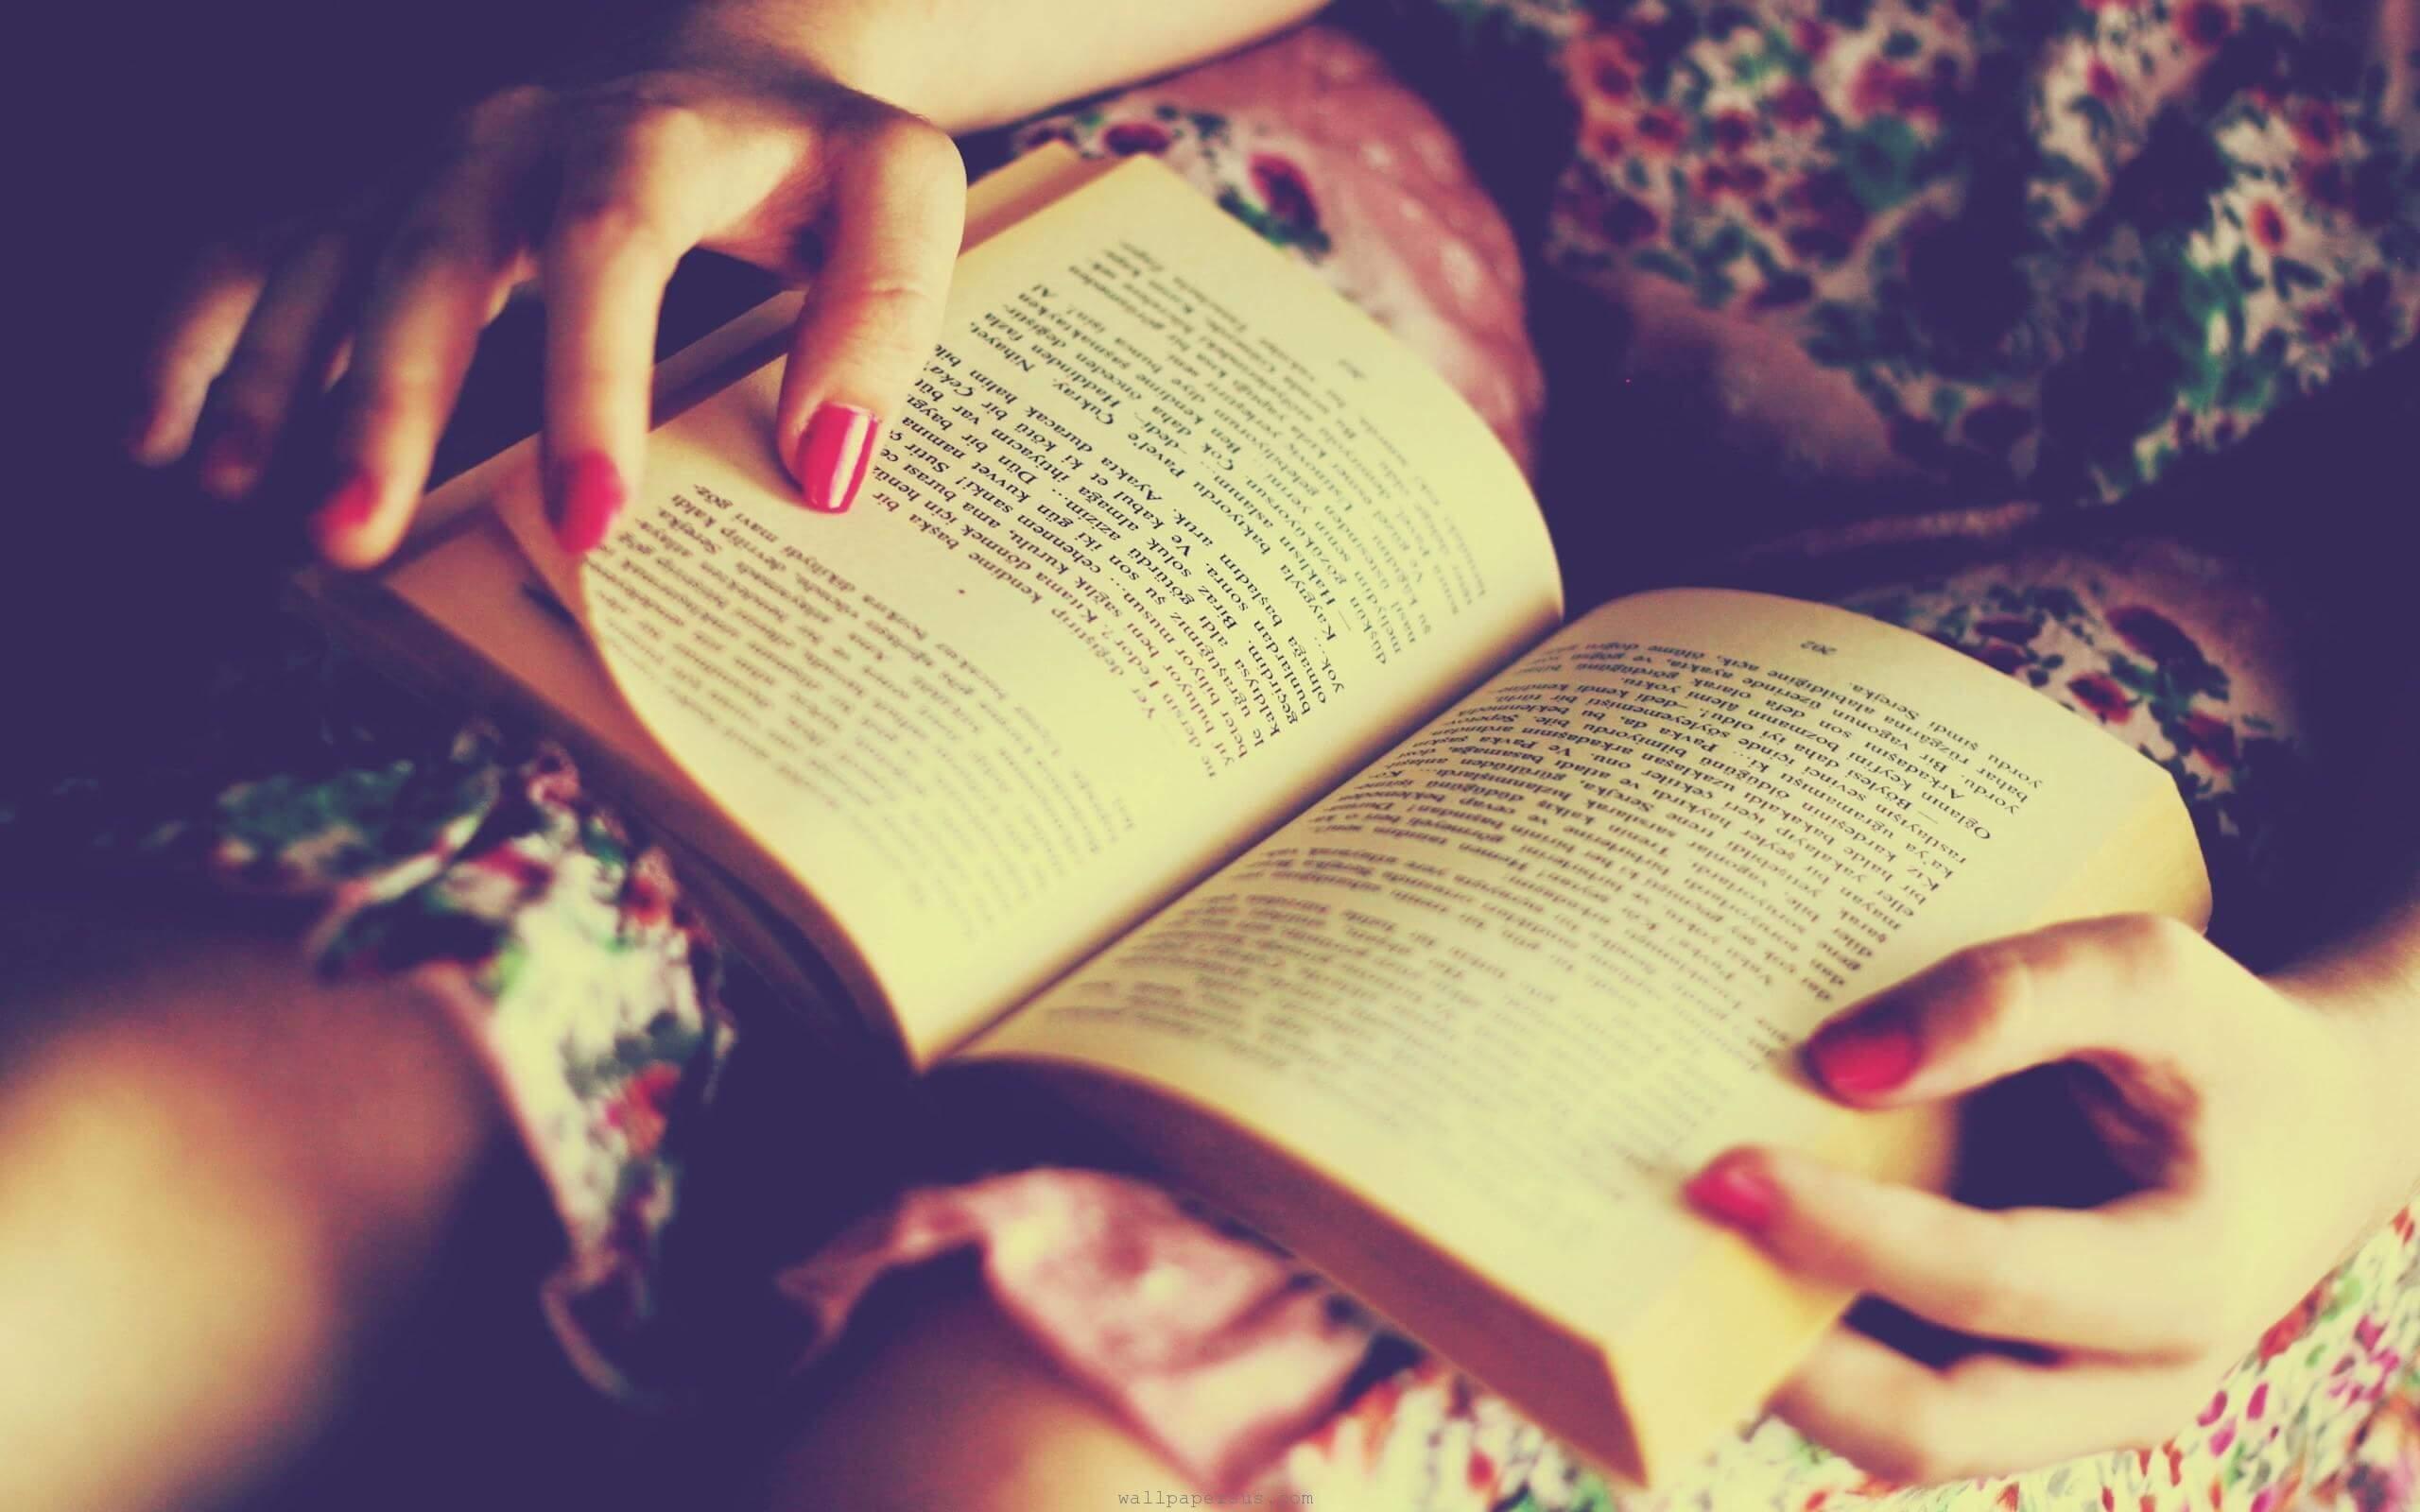 7 libros para que leas este verano